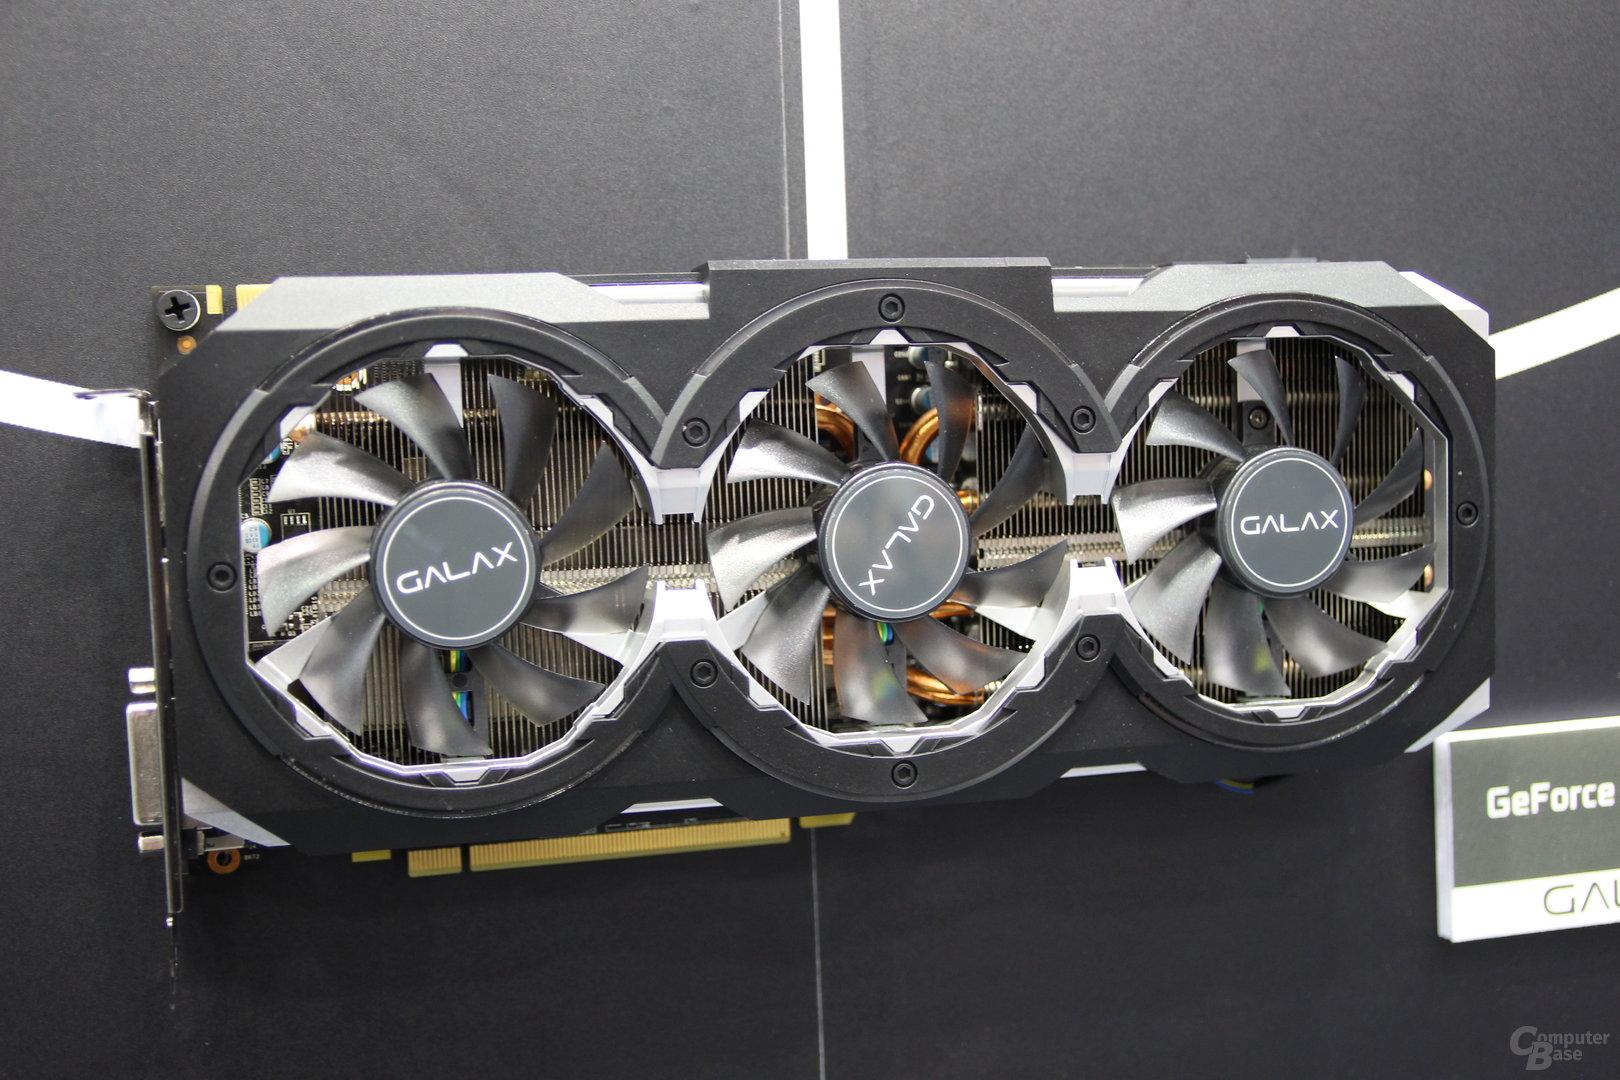 Galax GeForce GTX 1070 OC EX